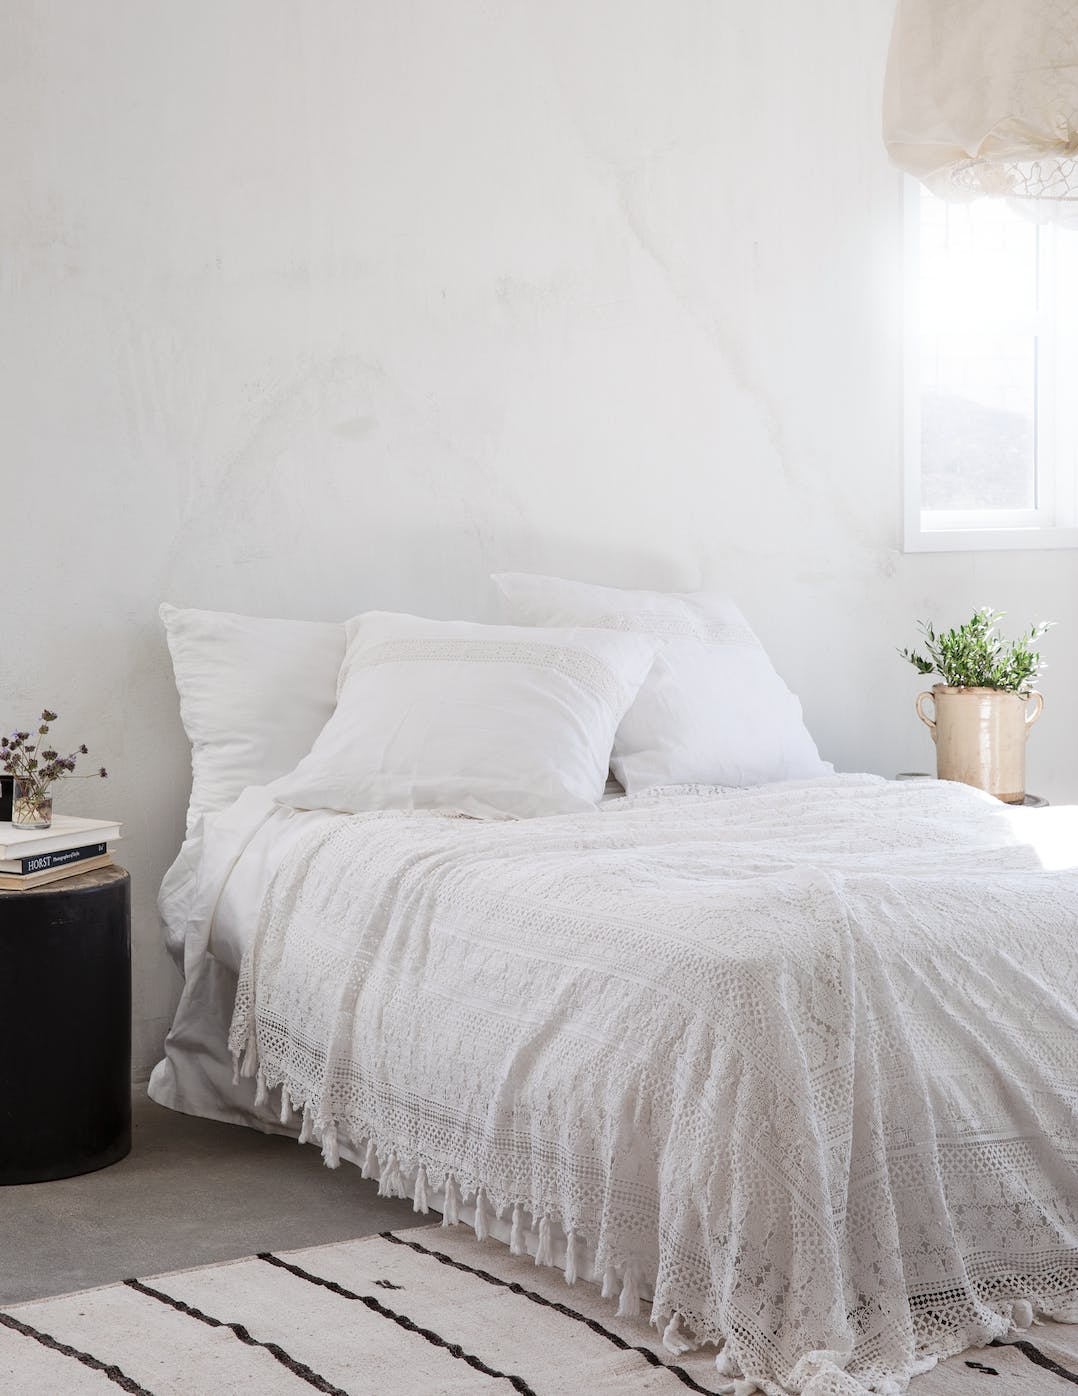 21 Minimalist Bedroom Ideas That Feel Cozy and Serene - PureWow